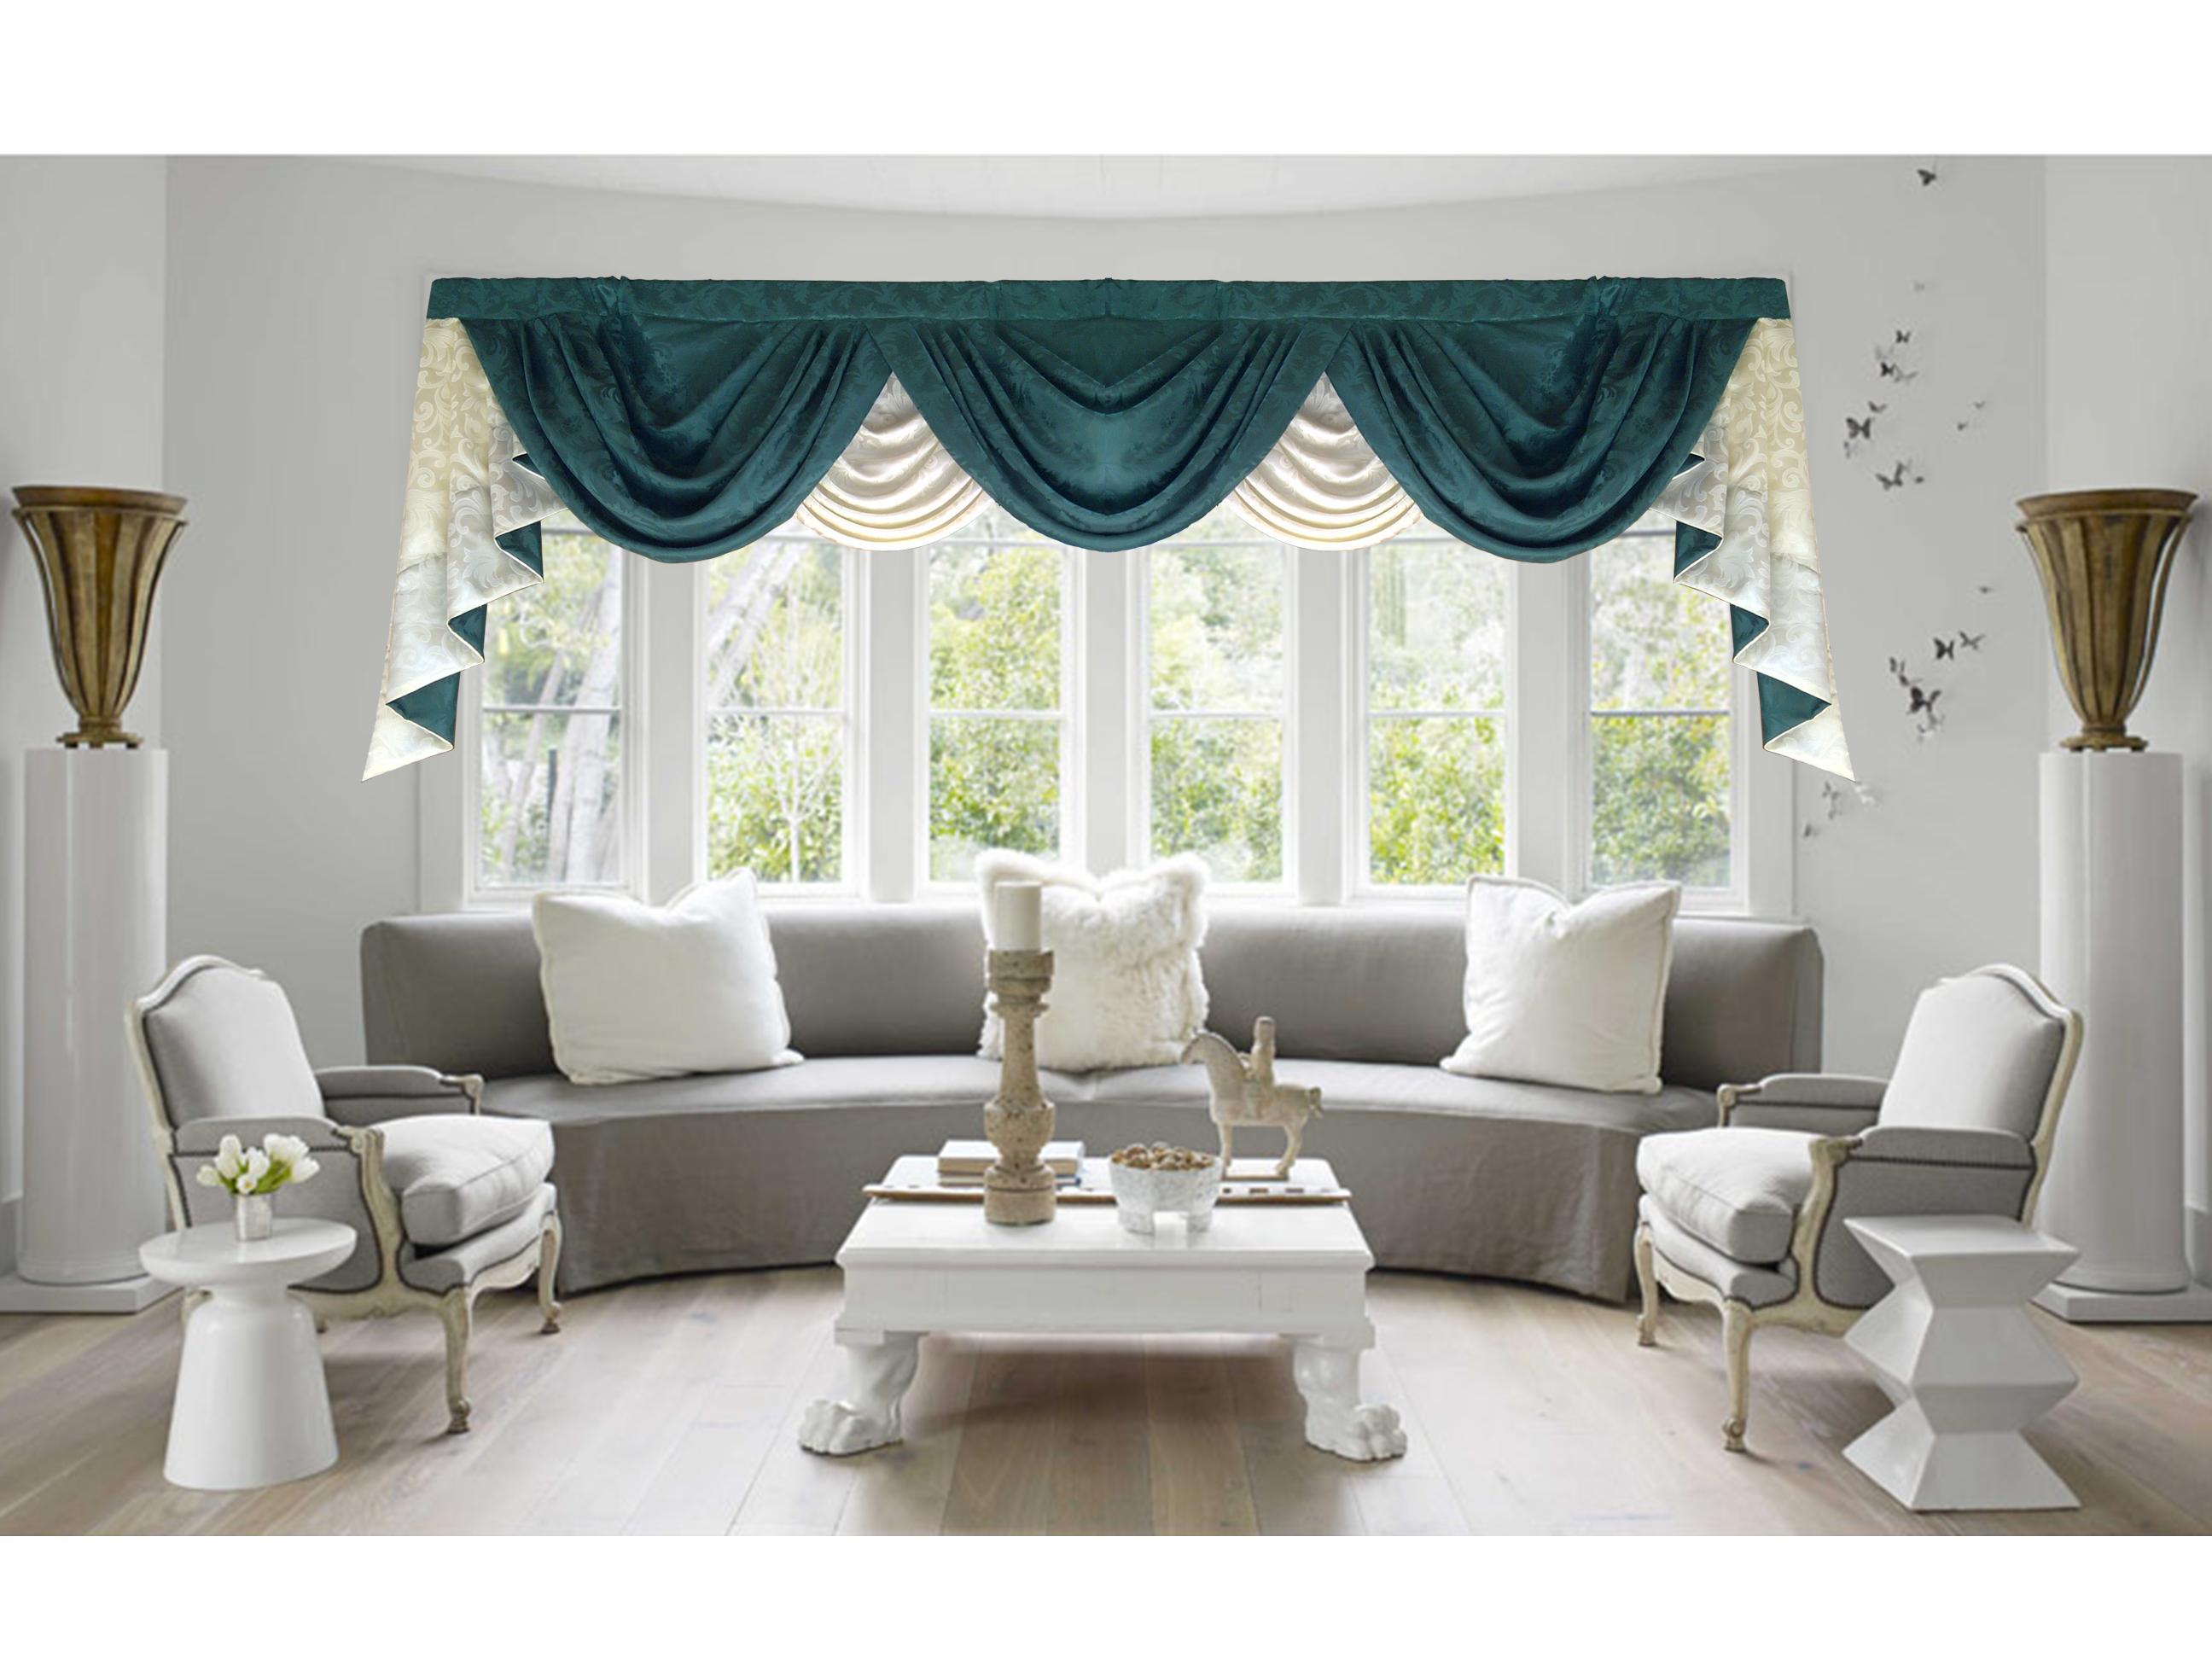 Window treatment ideas for a sunroom  swag valance  curtains  pinterest